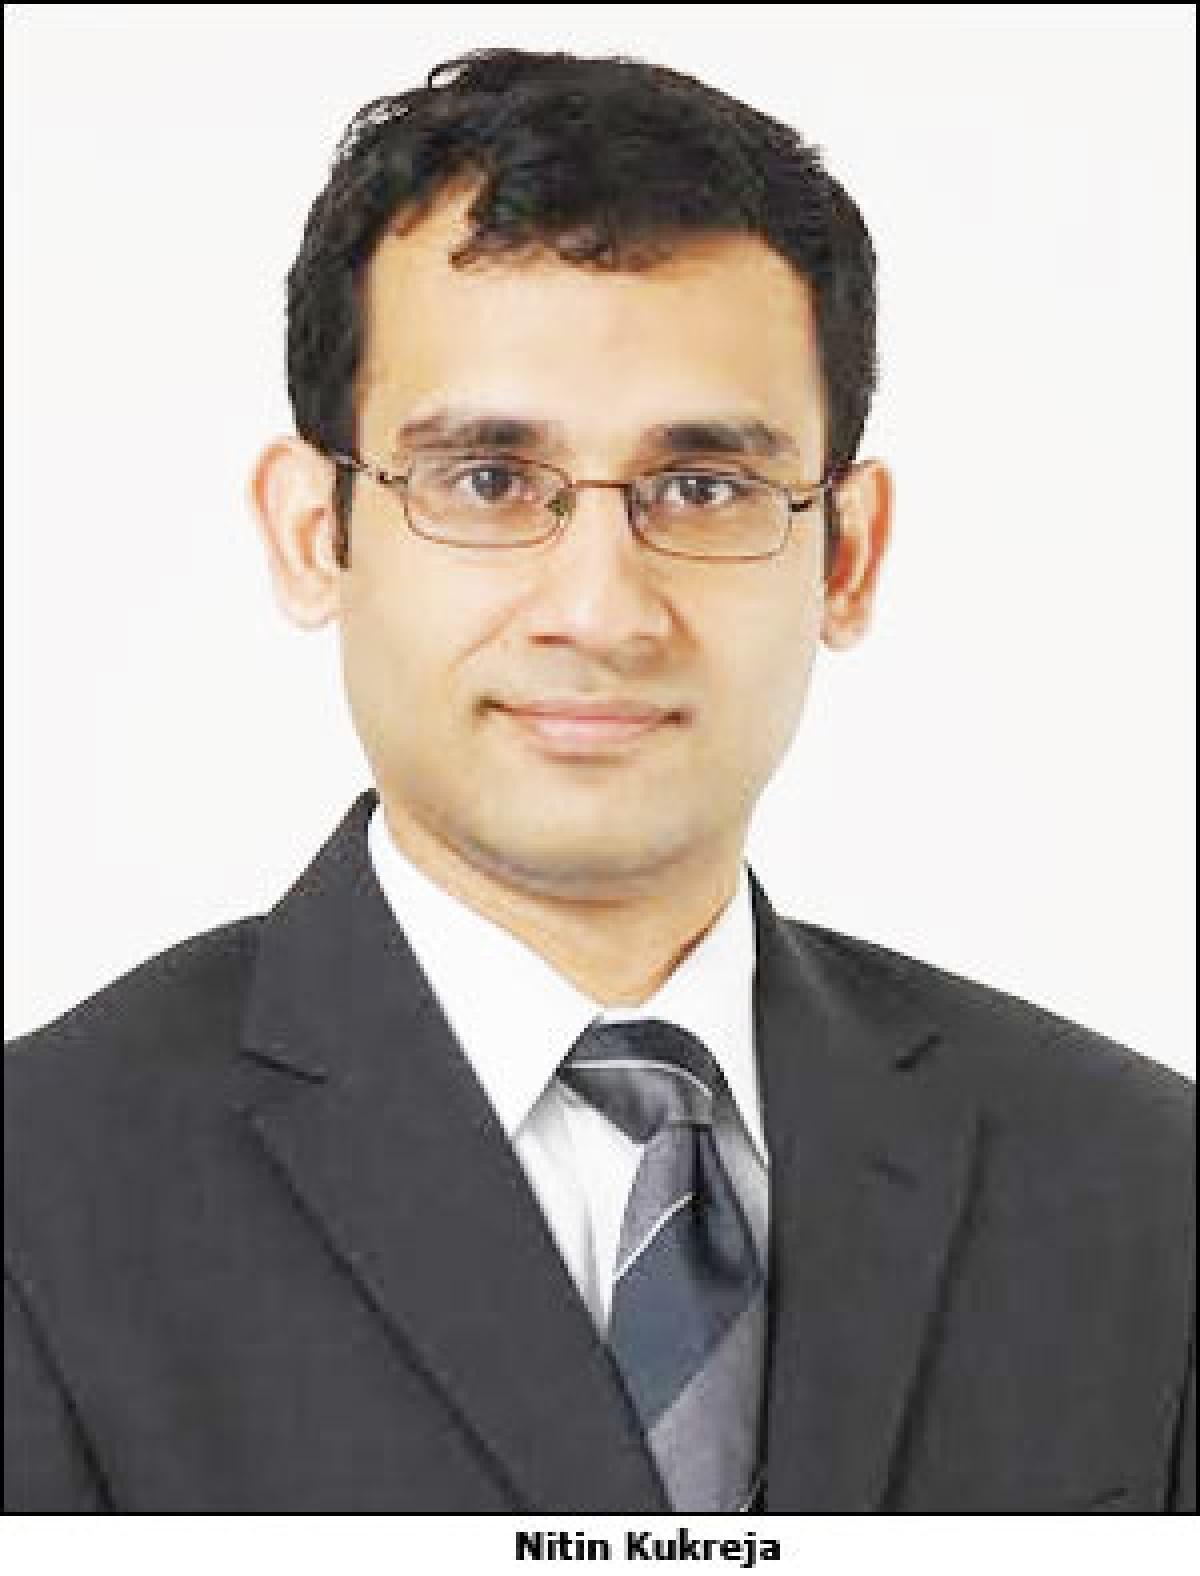 Allu Arjun to be the face of Pro Kabaddi in Telugu states